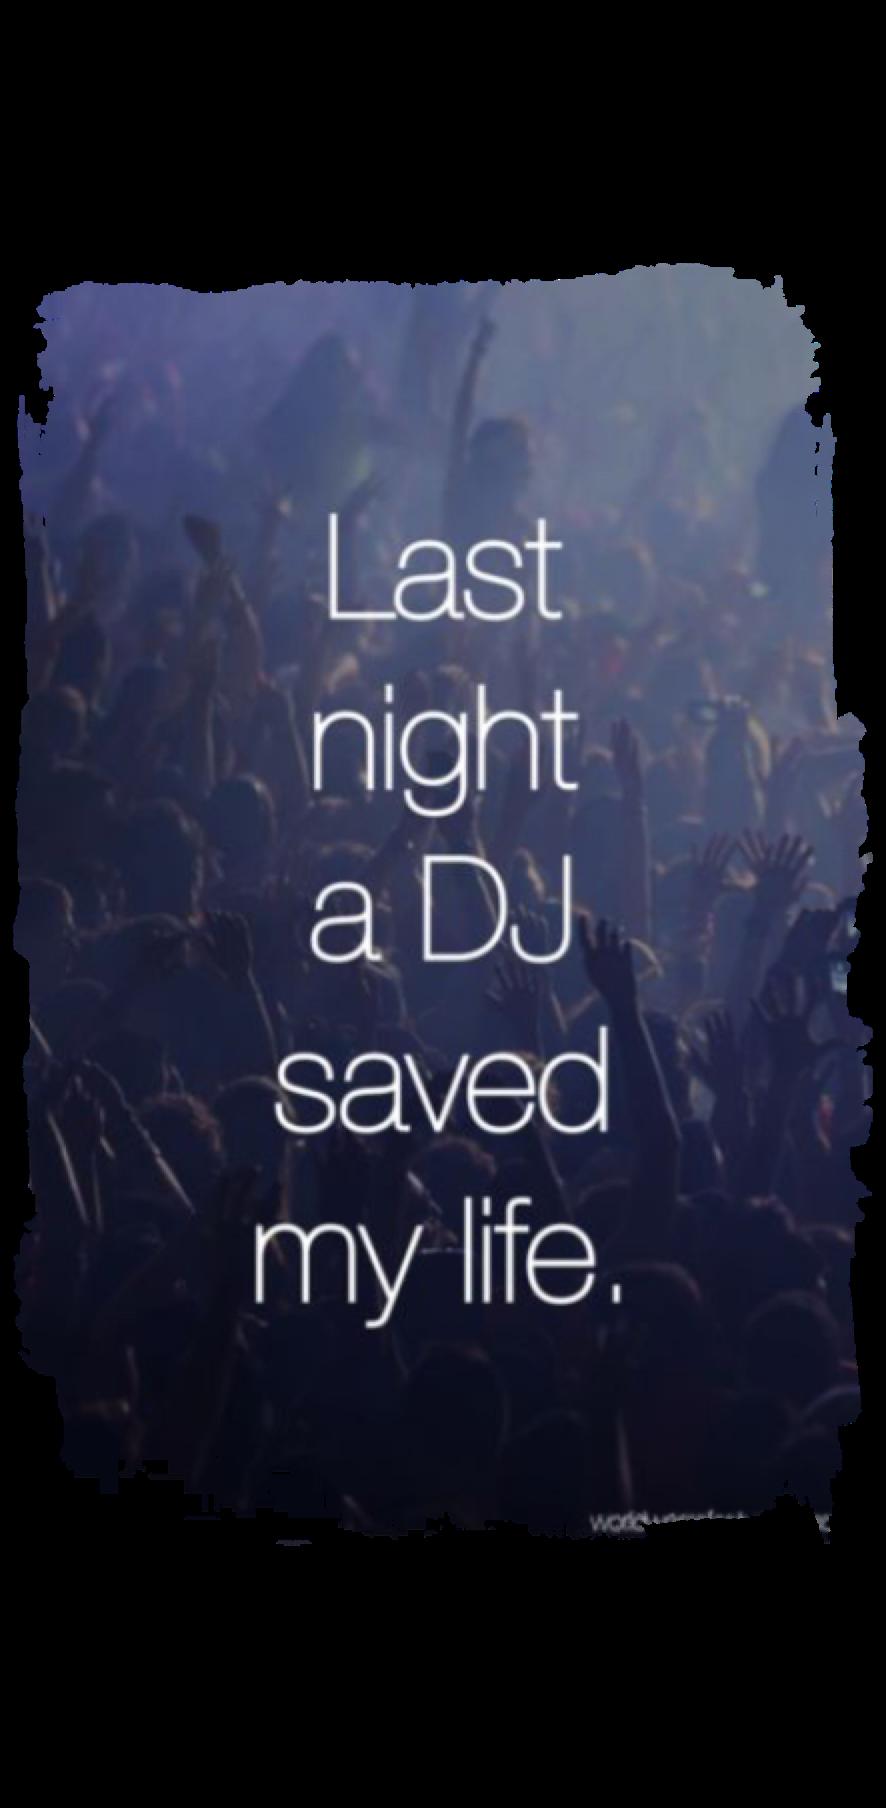 cover Last night a dj saved my life .